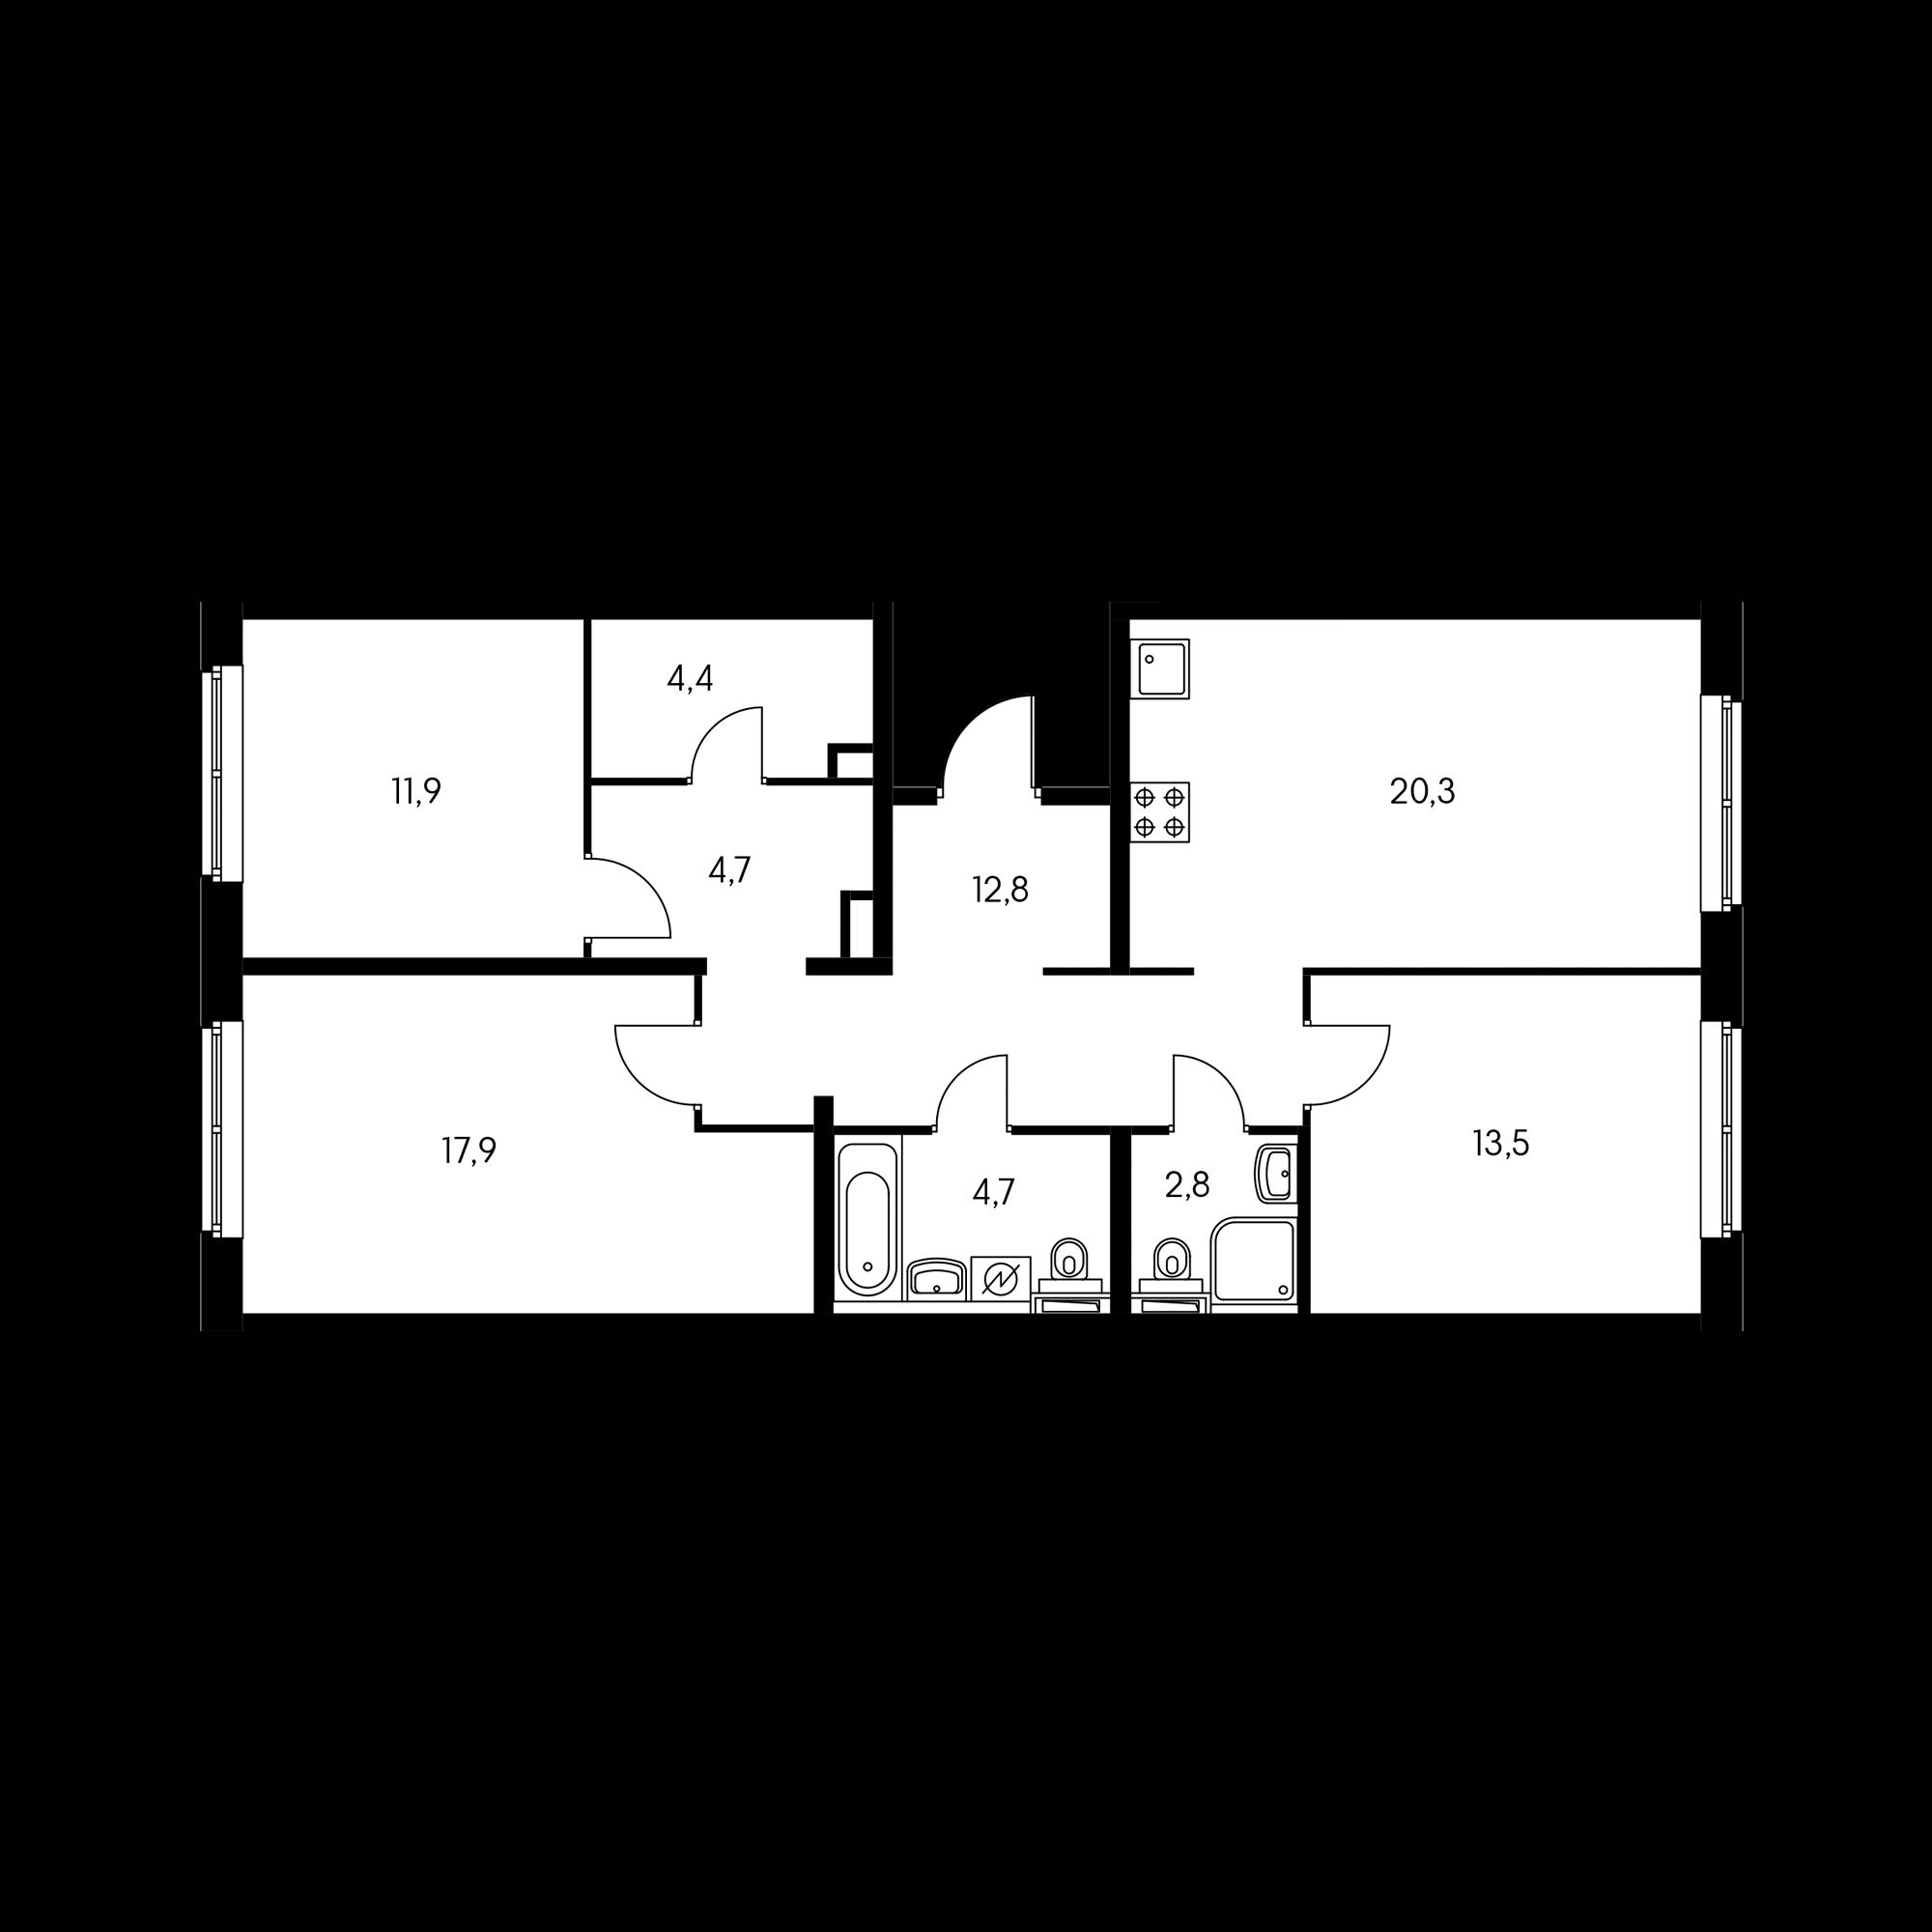 3EL5_6.9-1*